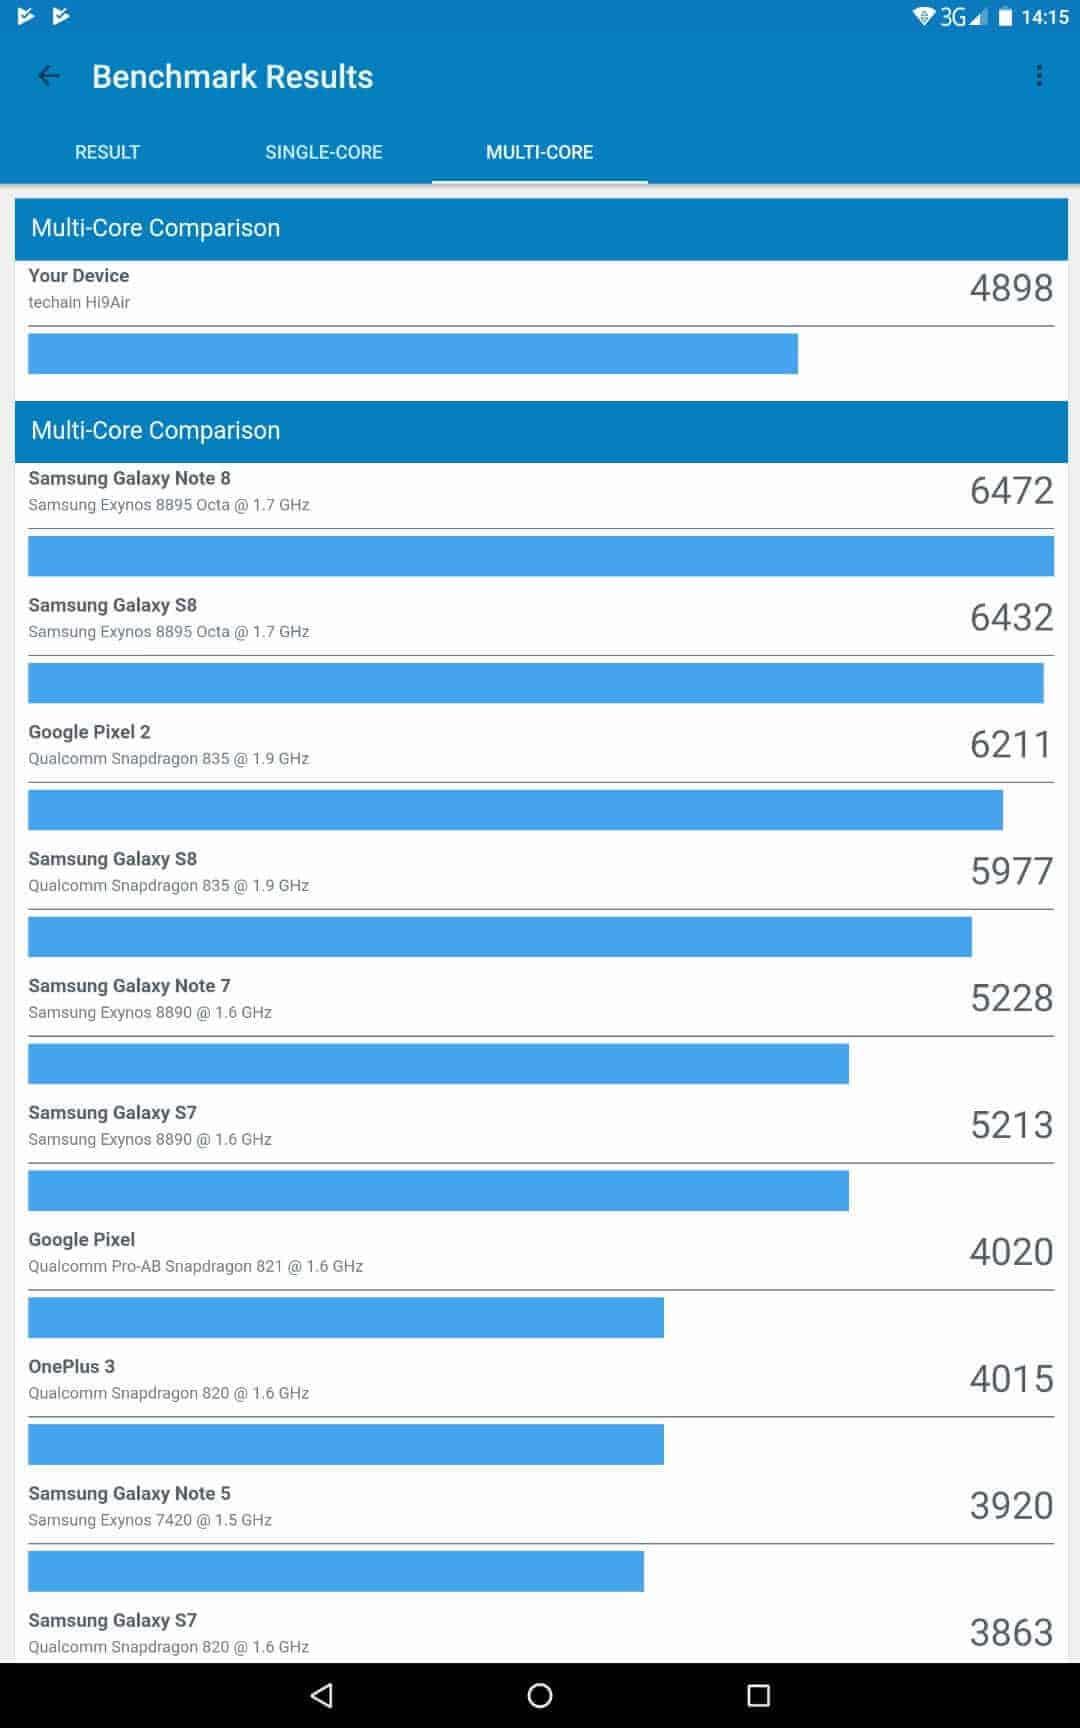 Chuwi Hi9 Air Review Screenshot Bench Results 03